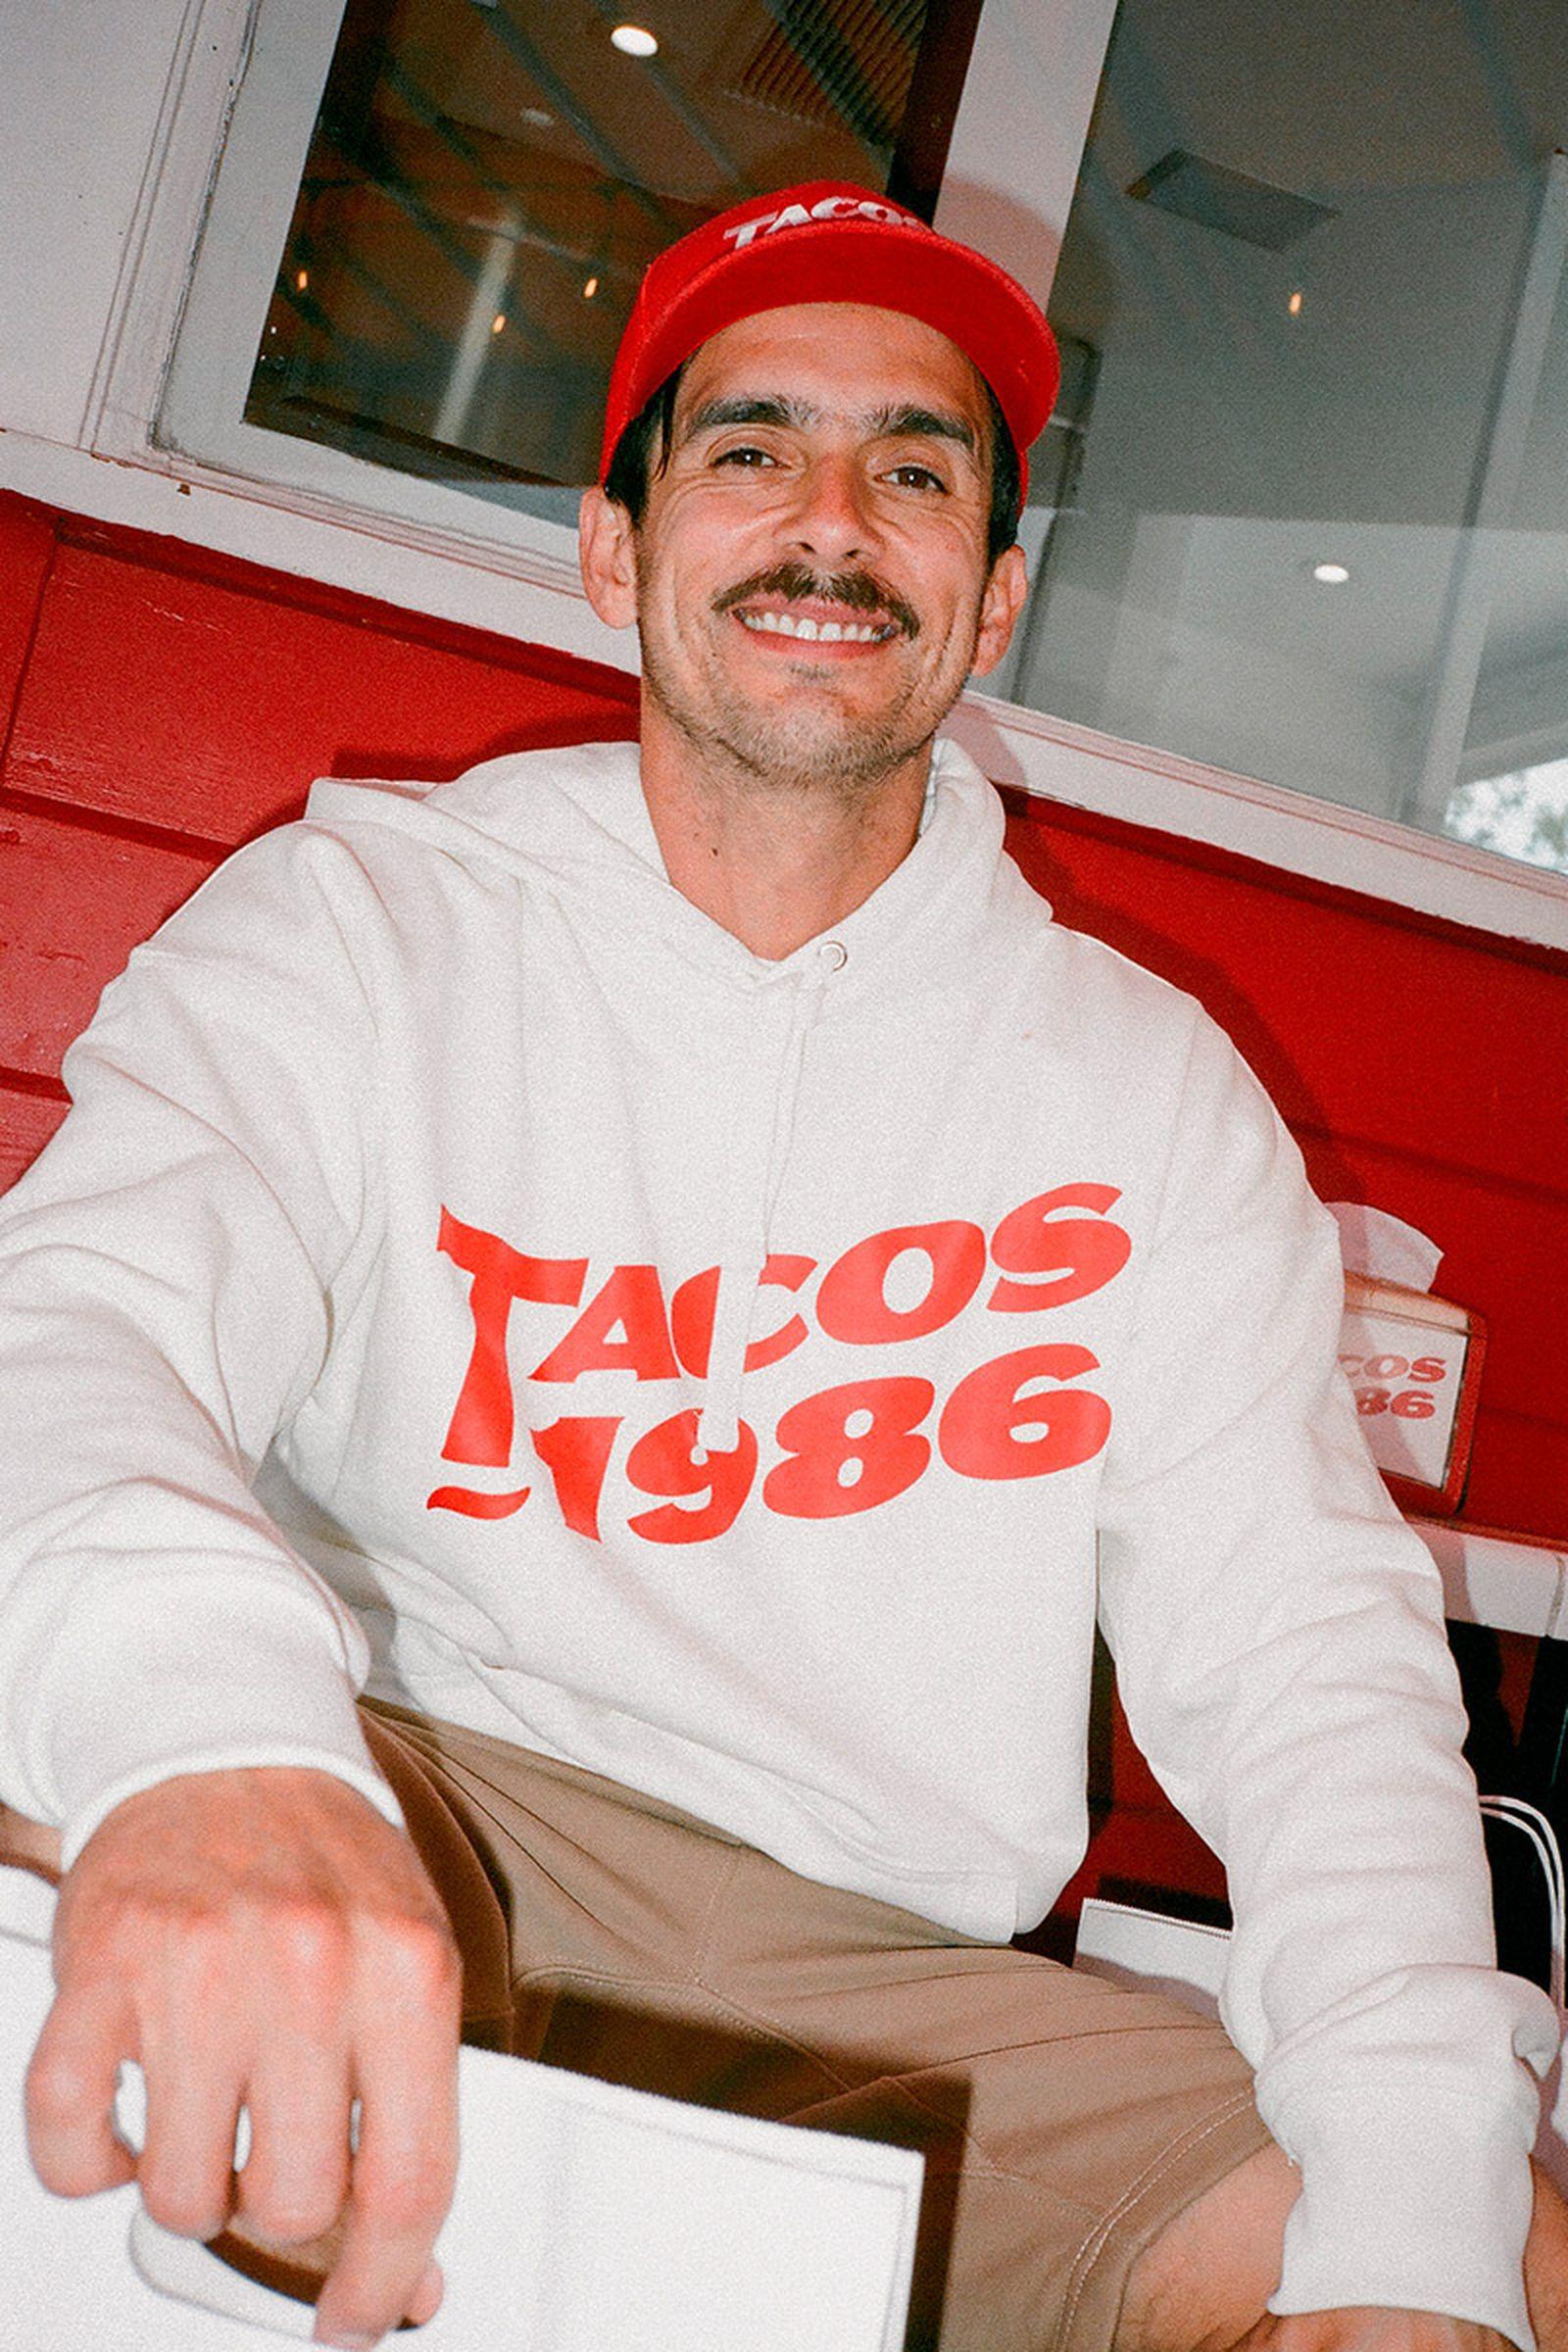 tacos-1986-x-hm-blank-staples-06